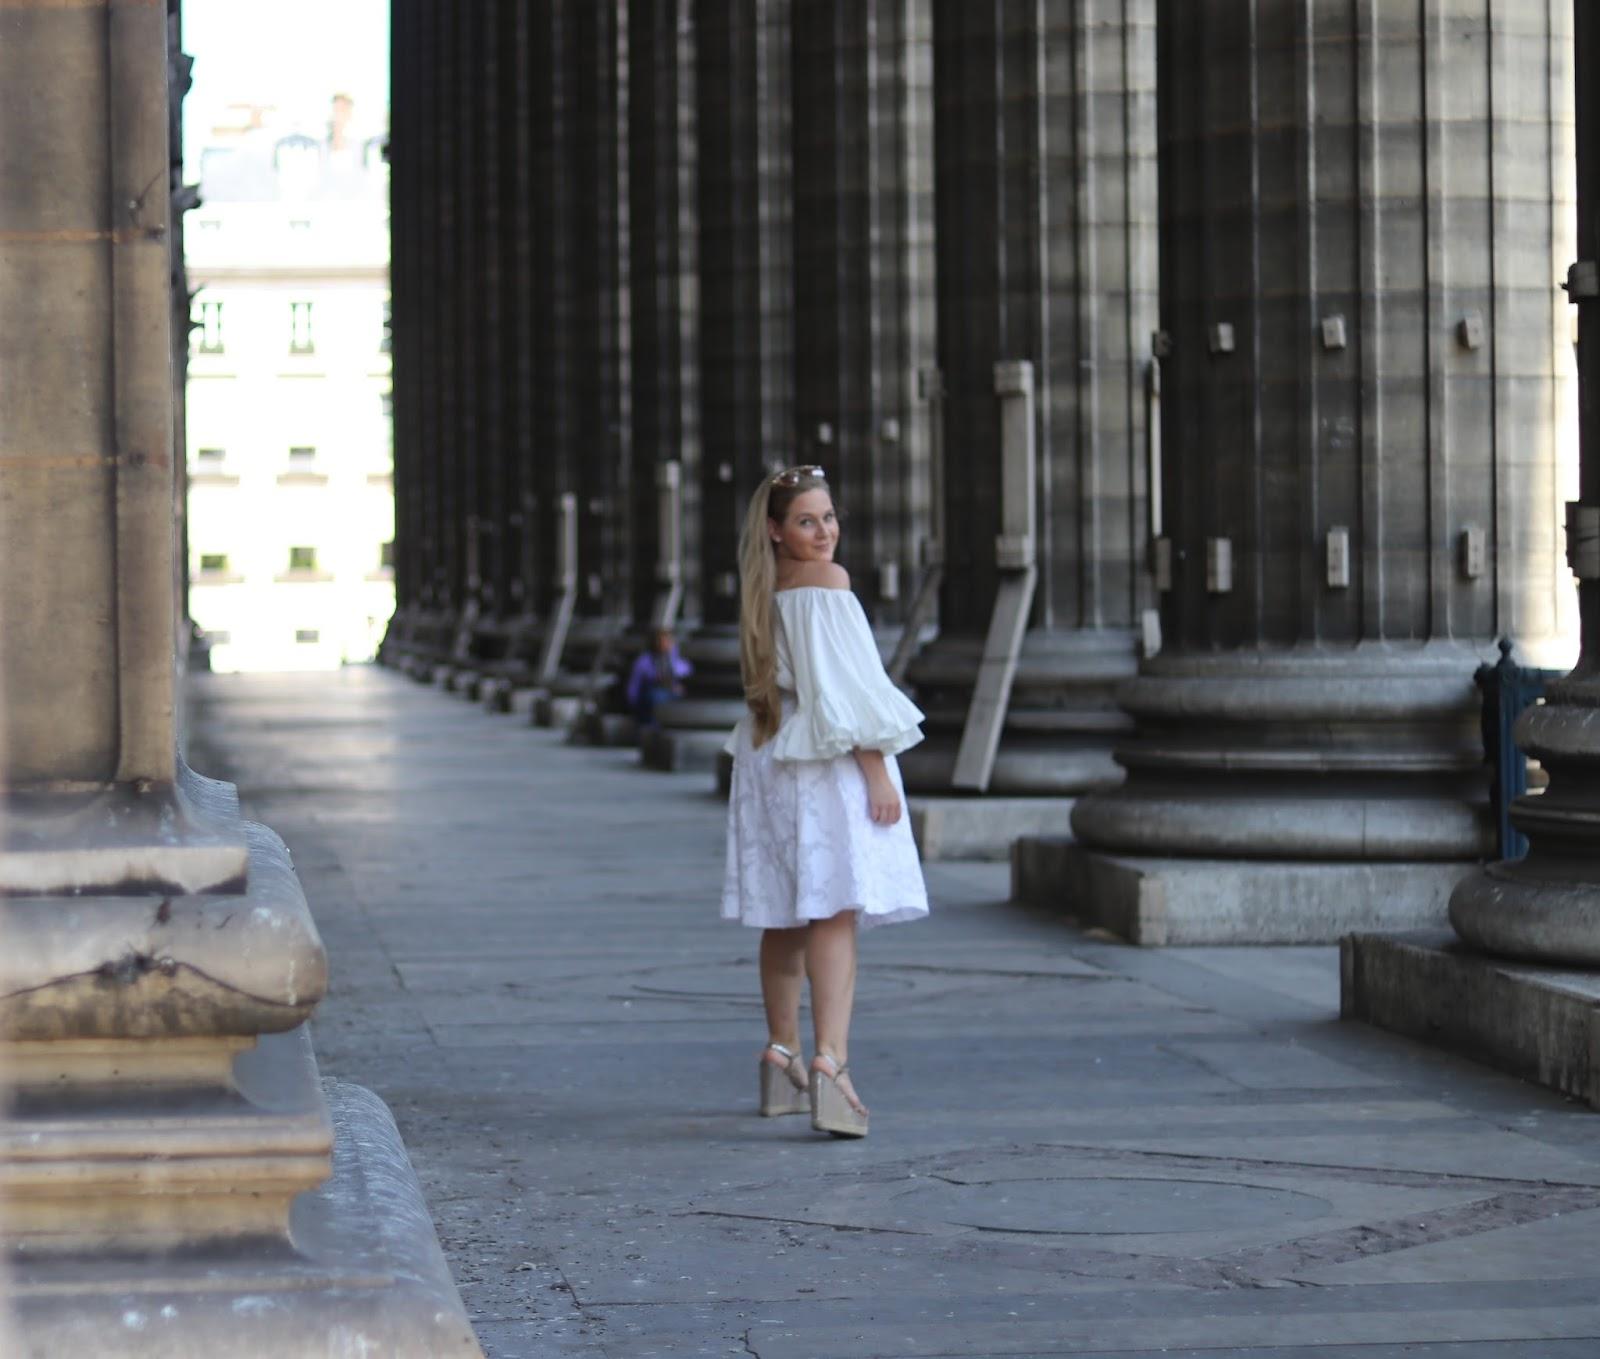 Blonde Girl, Katie Heath wearing all white in front of Pillars, Paris, France